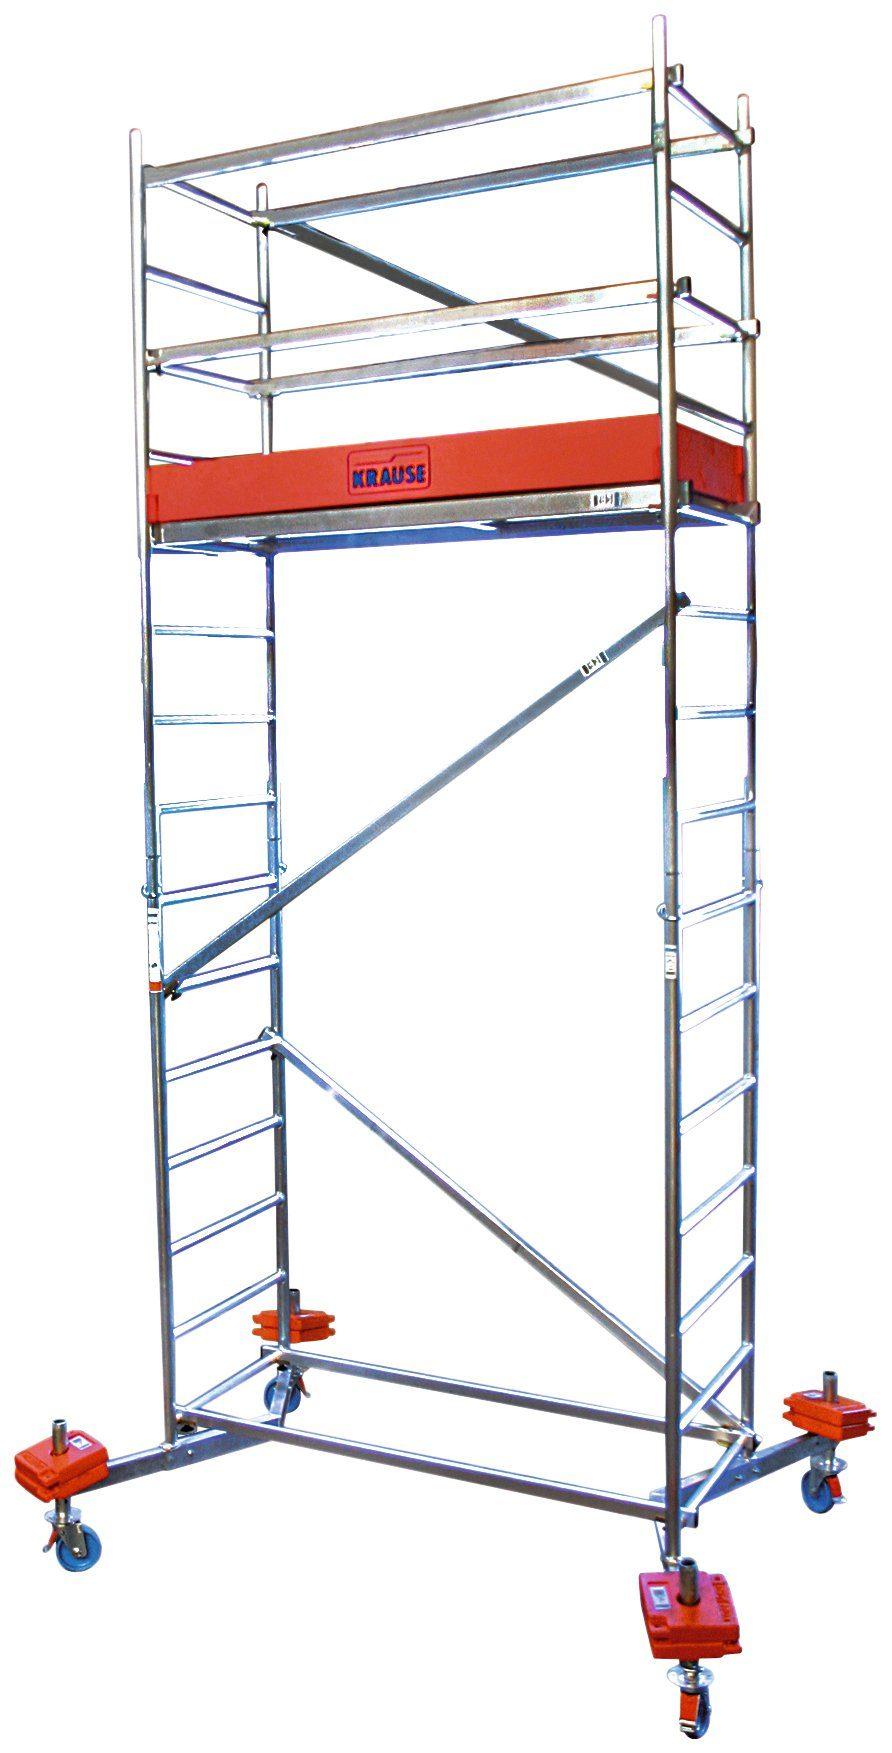 KRAUSE Fahrgerüst »ClimTec«, Max. Arbeitshöhe 5 m, inkl. Fahrrollensatz 150 mm